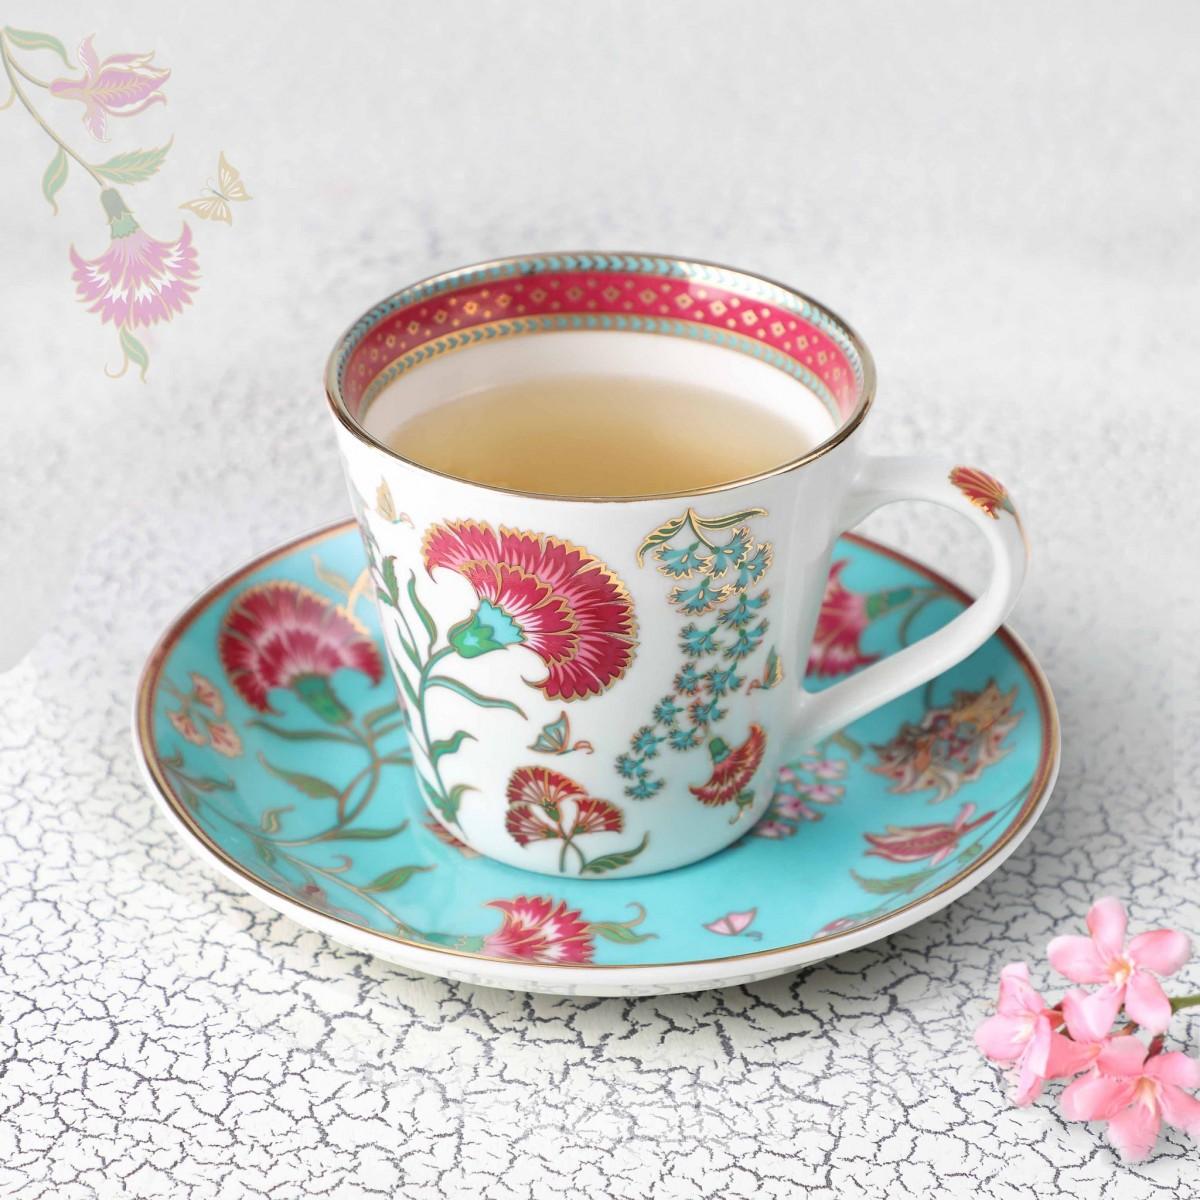 24 Carat Gold Rim Tea Cup & Saucer - White (single pc)